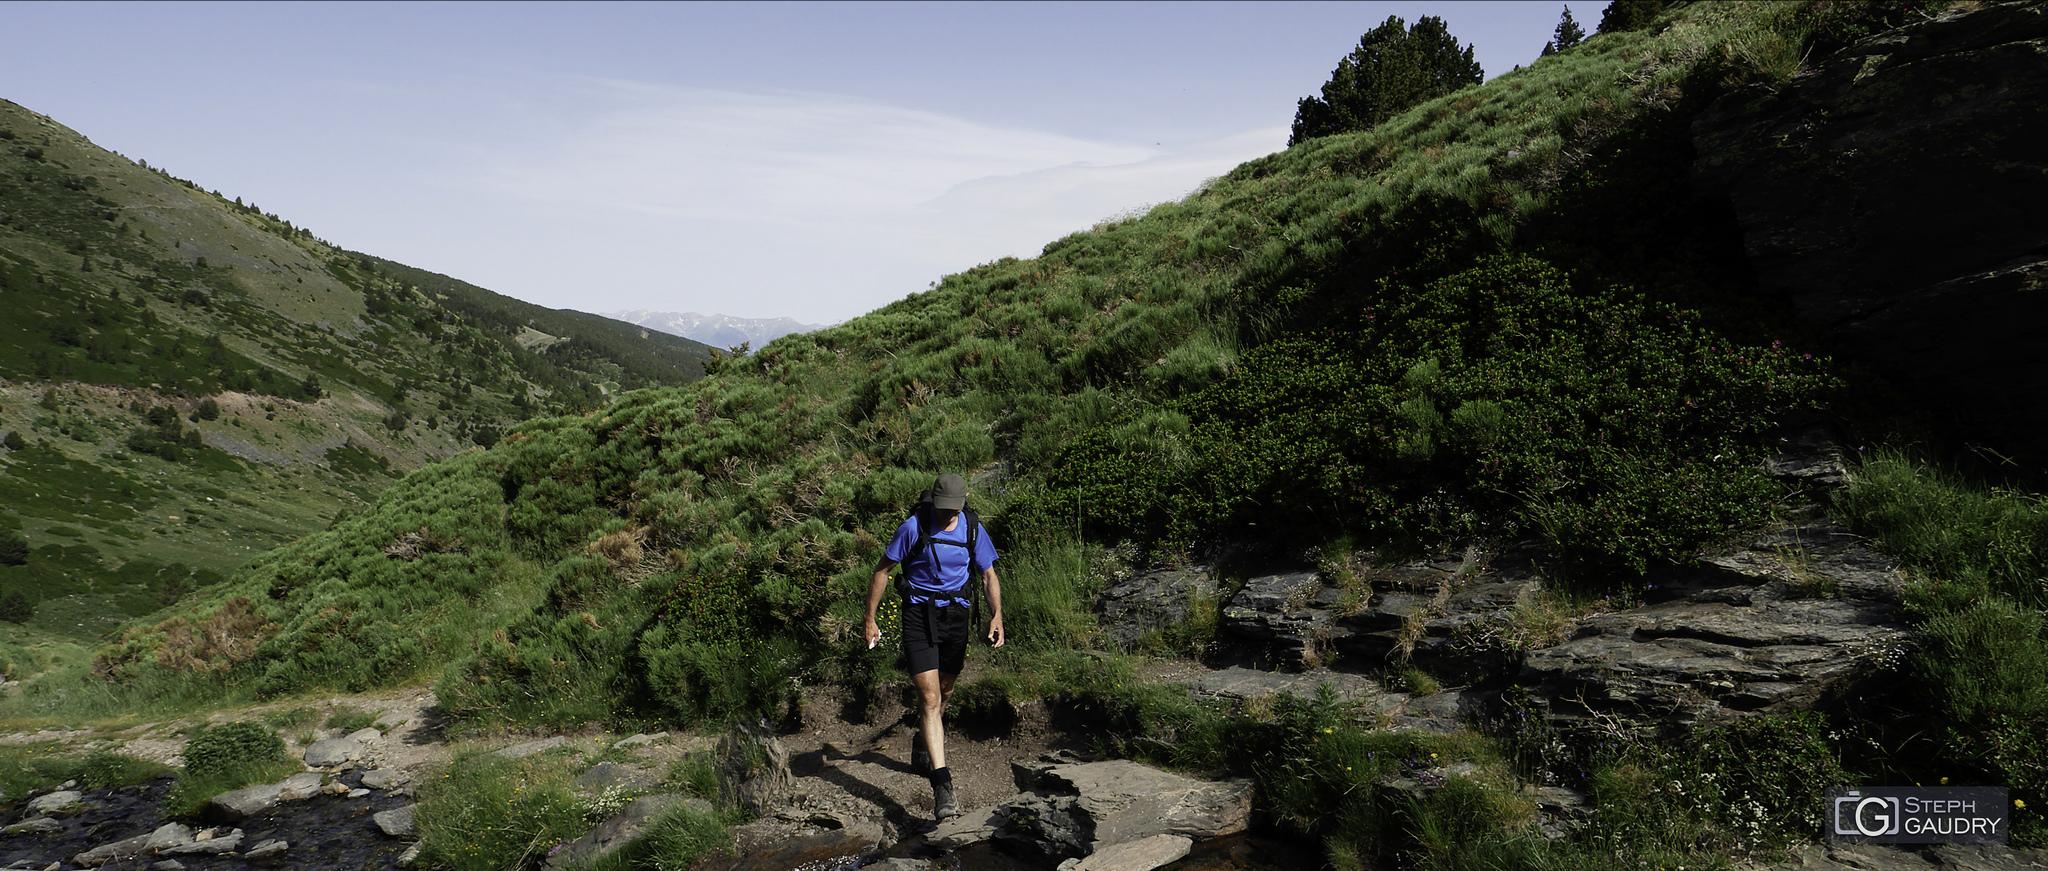 Balade du Puigmal 2015_07_04_090452 [Click to start slideshow]